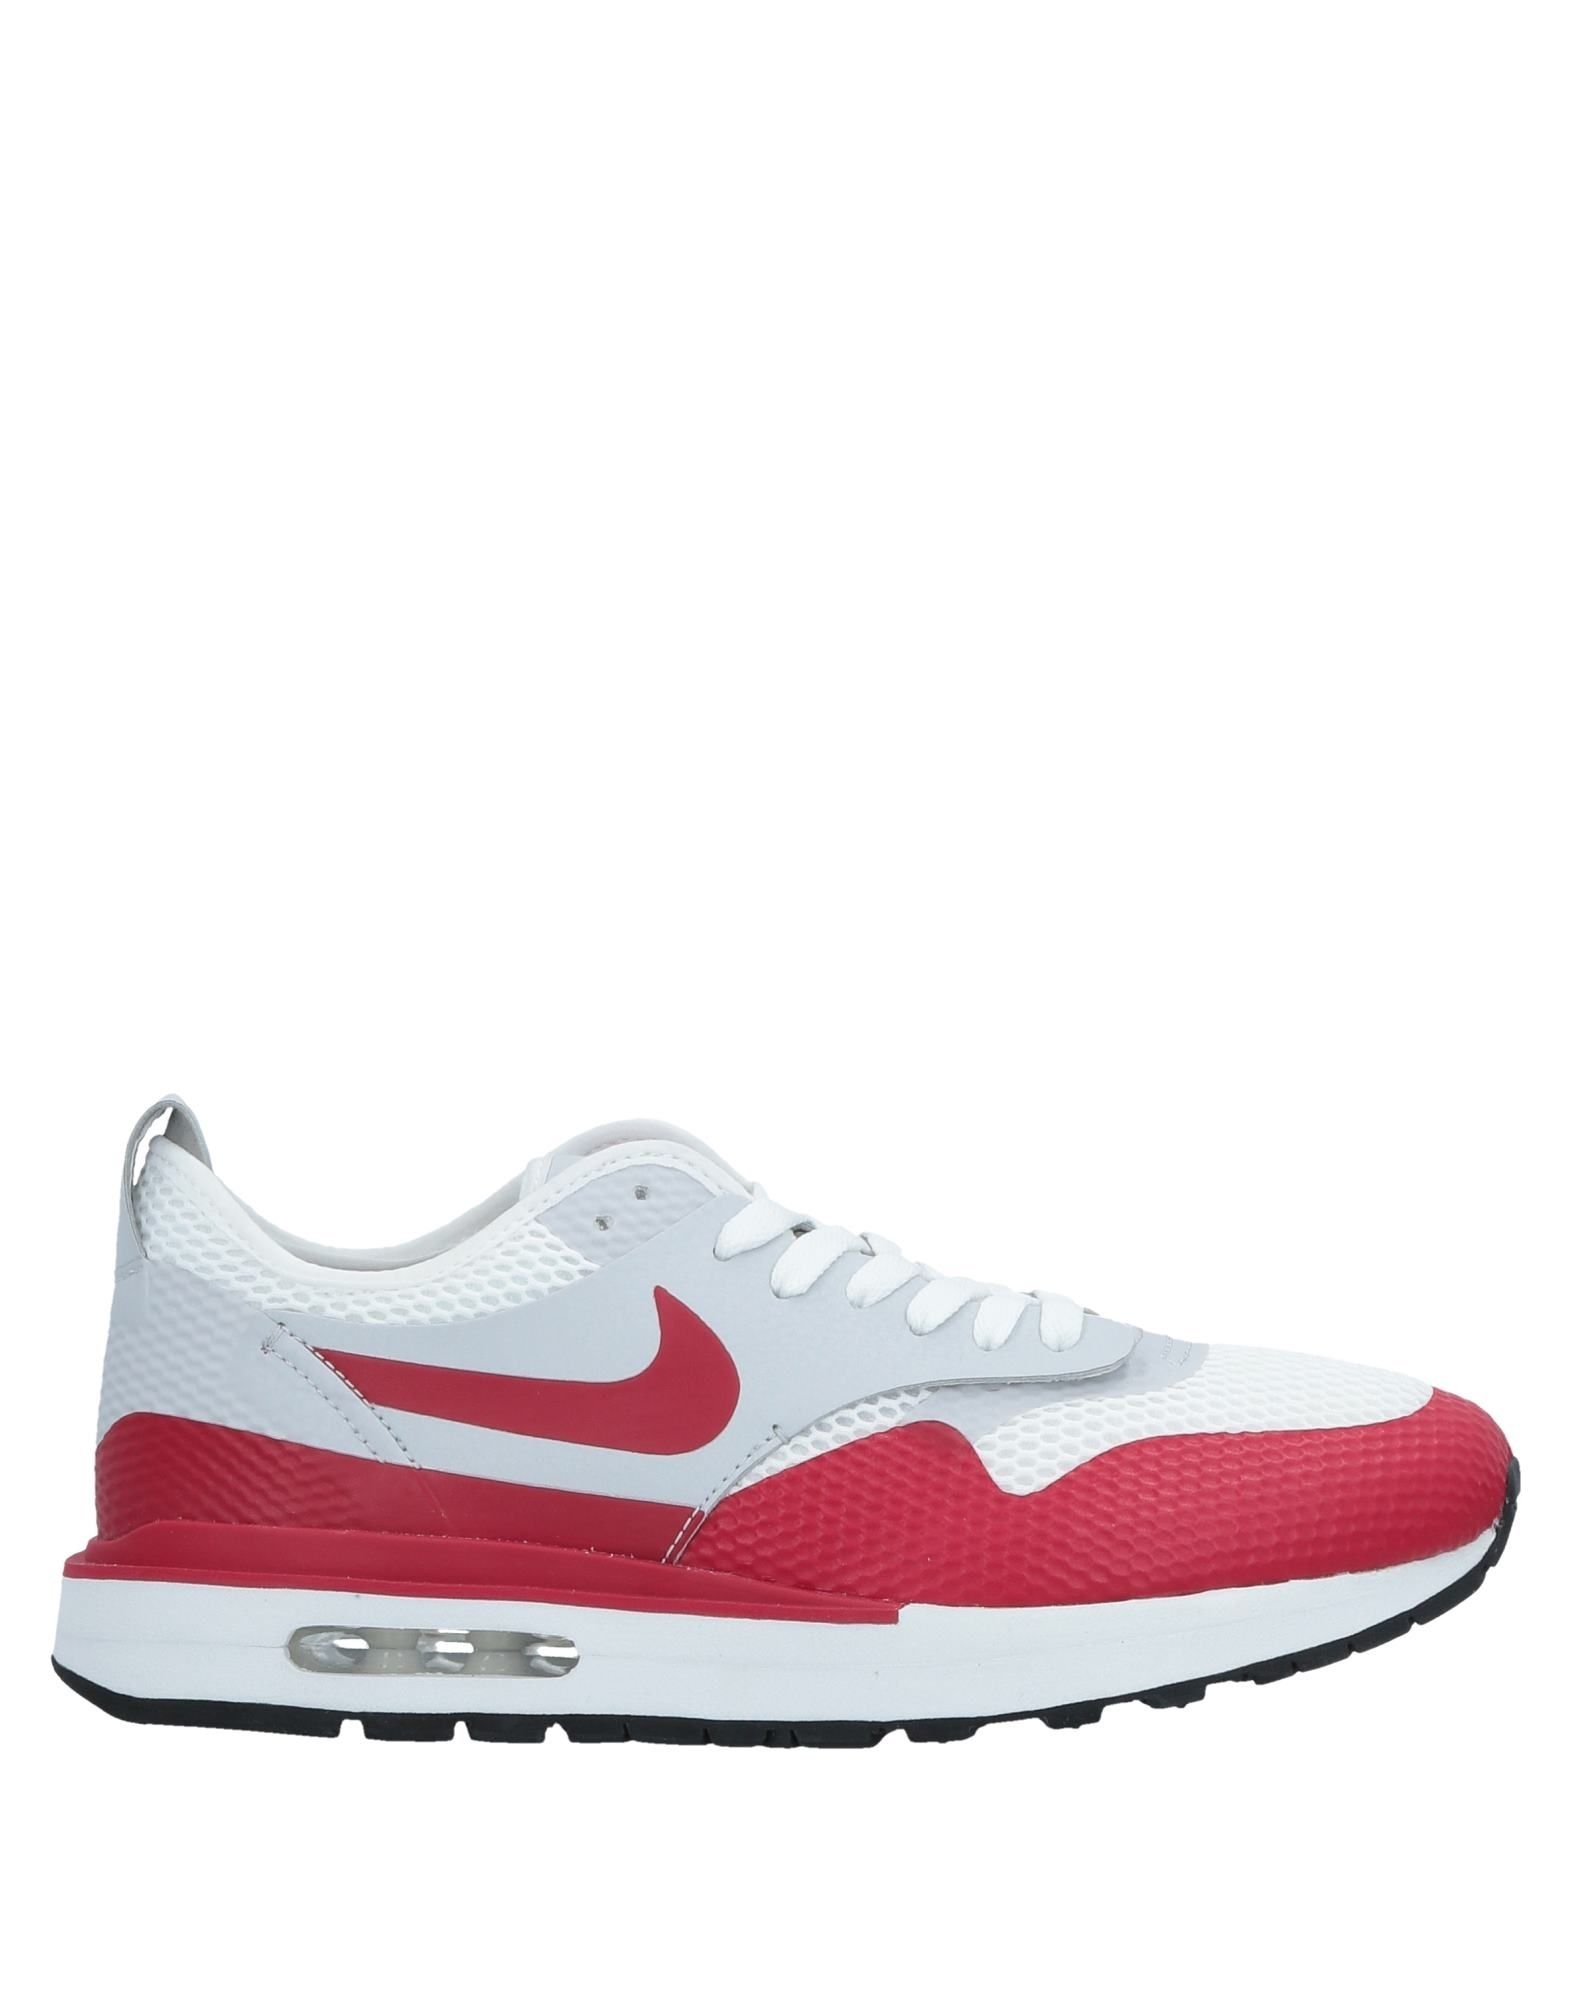 Moda Ginnastica Scarpe da Ginnastica Moda Nike Uomo - 11521531QJ 14b4f6